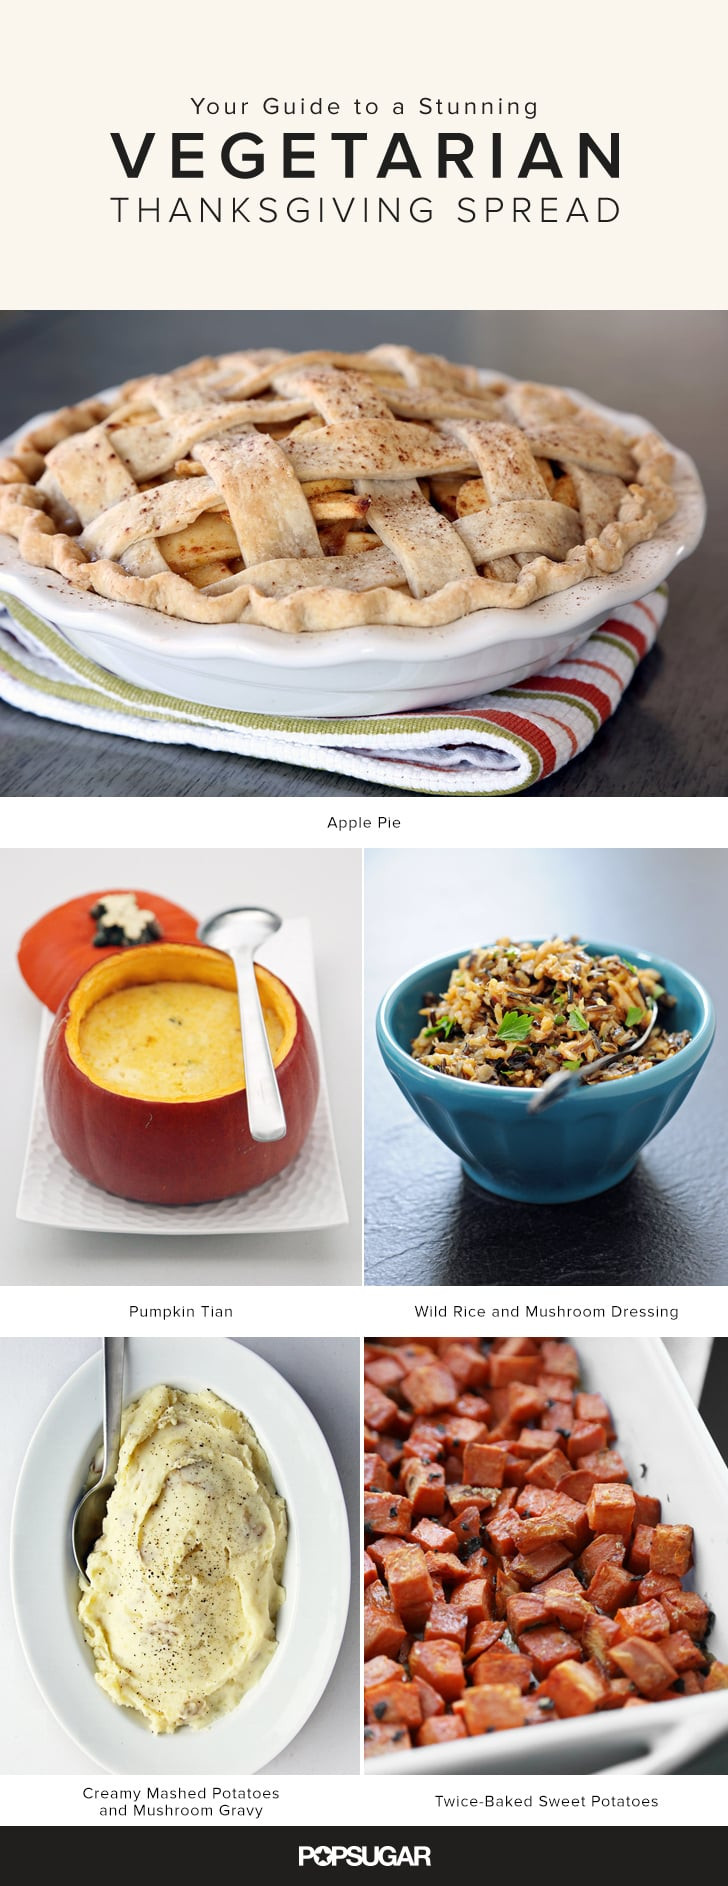 Vegetarian Thanksgiving Food  Ve arian Thanksgiving Menu and Recipes